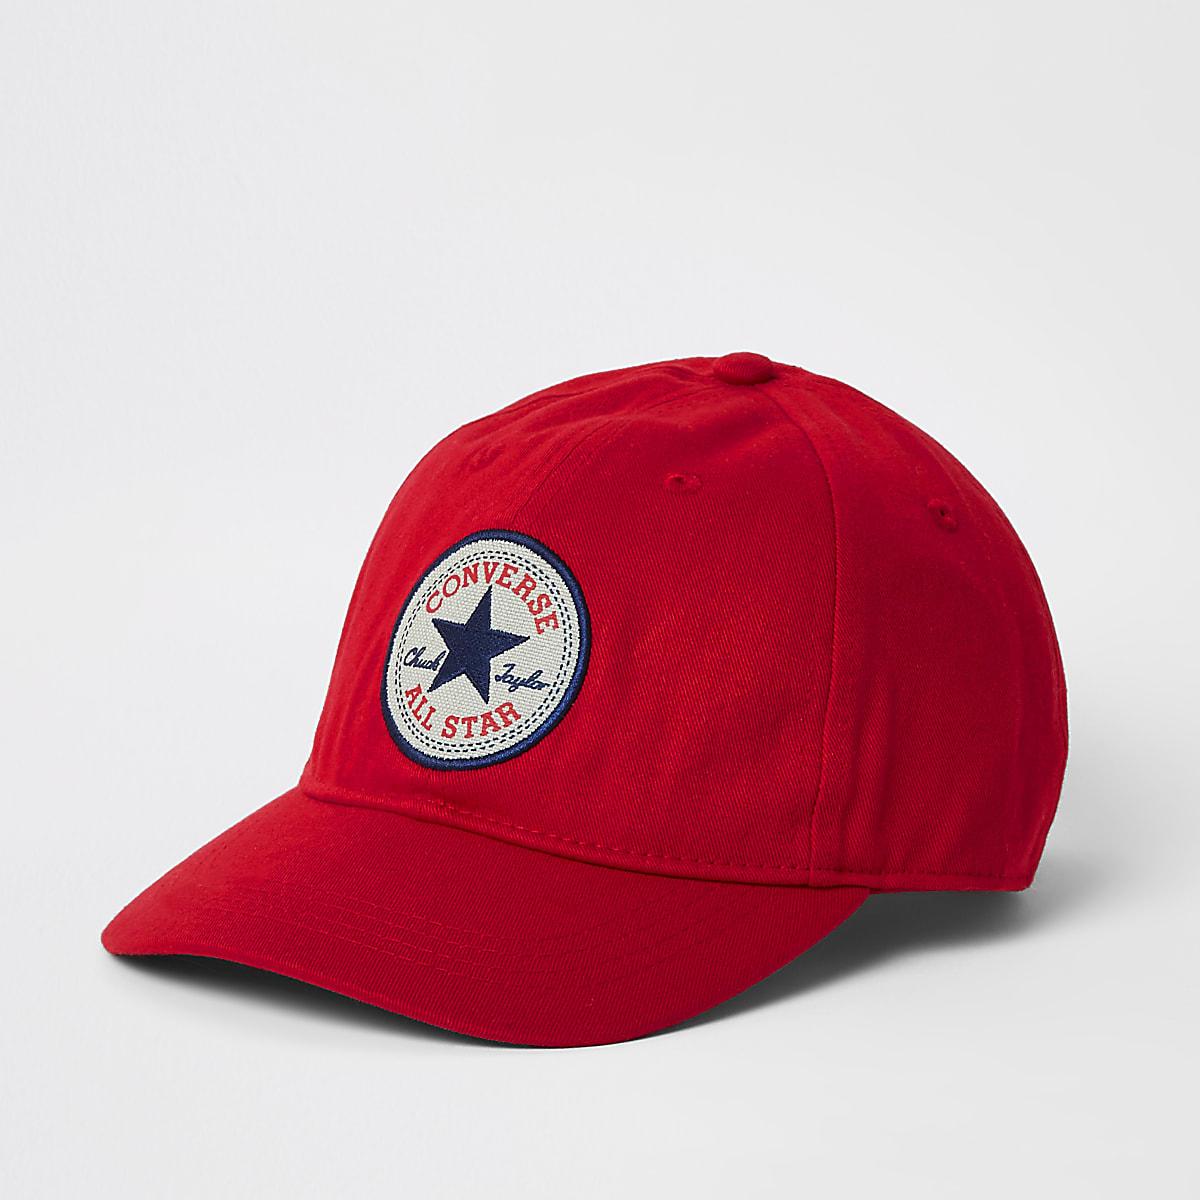 f48d6e49 Kids red Converse cap - Hats - Accessories - boys